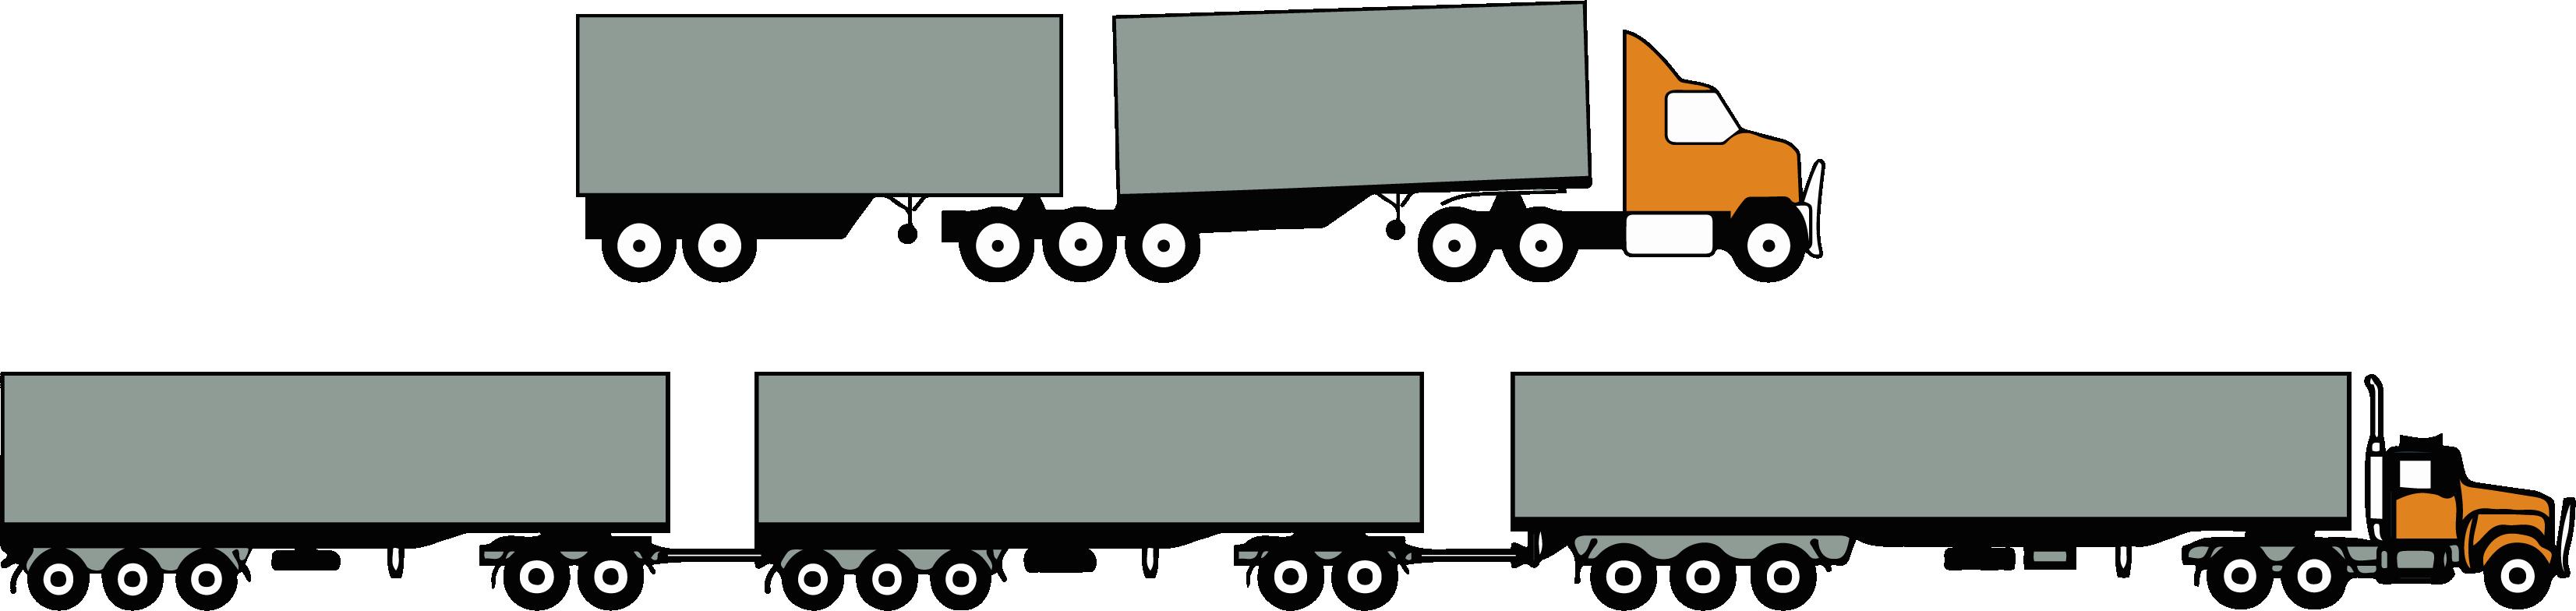 MC Vehicles